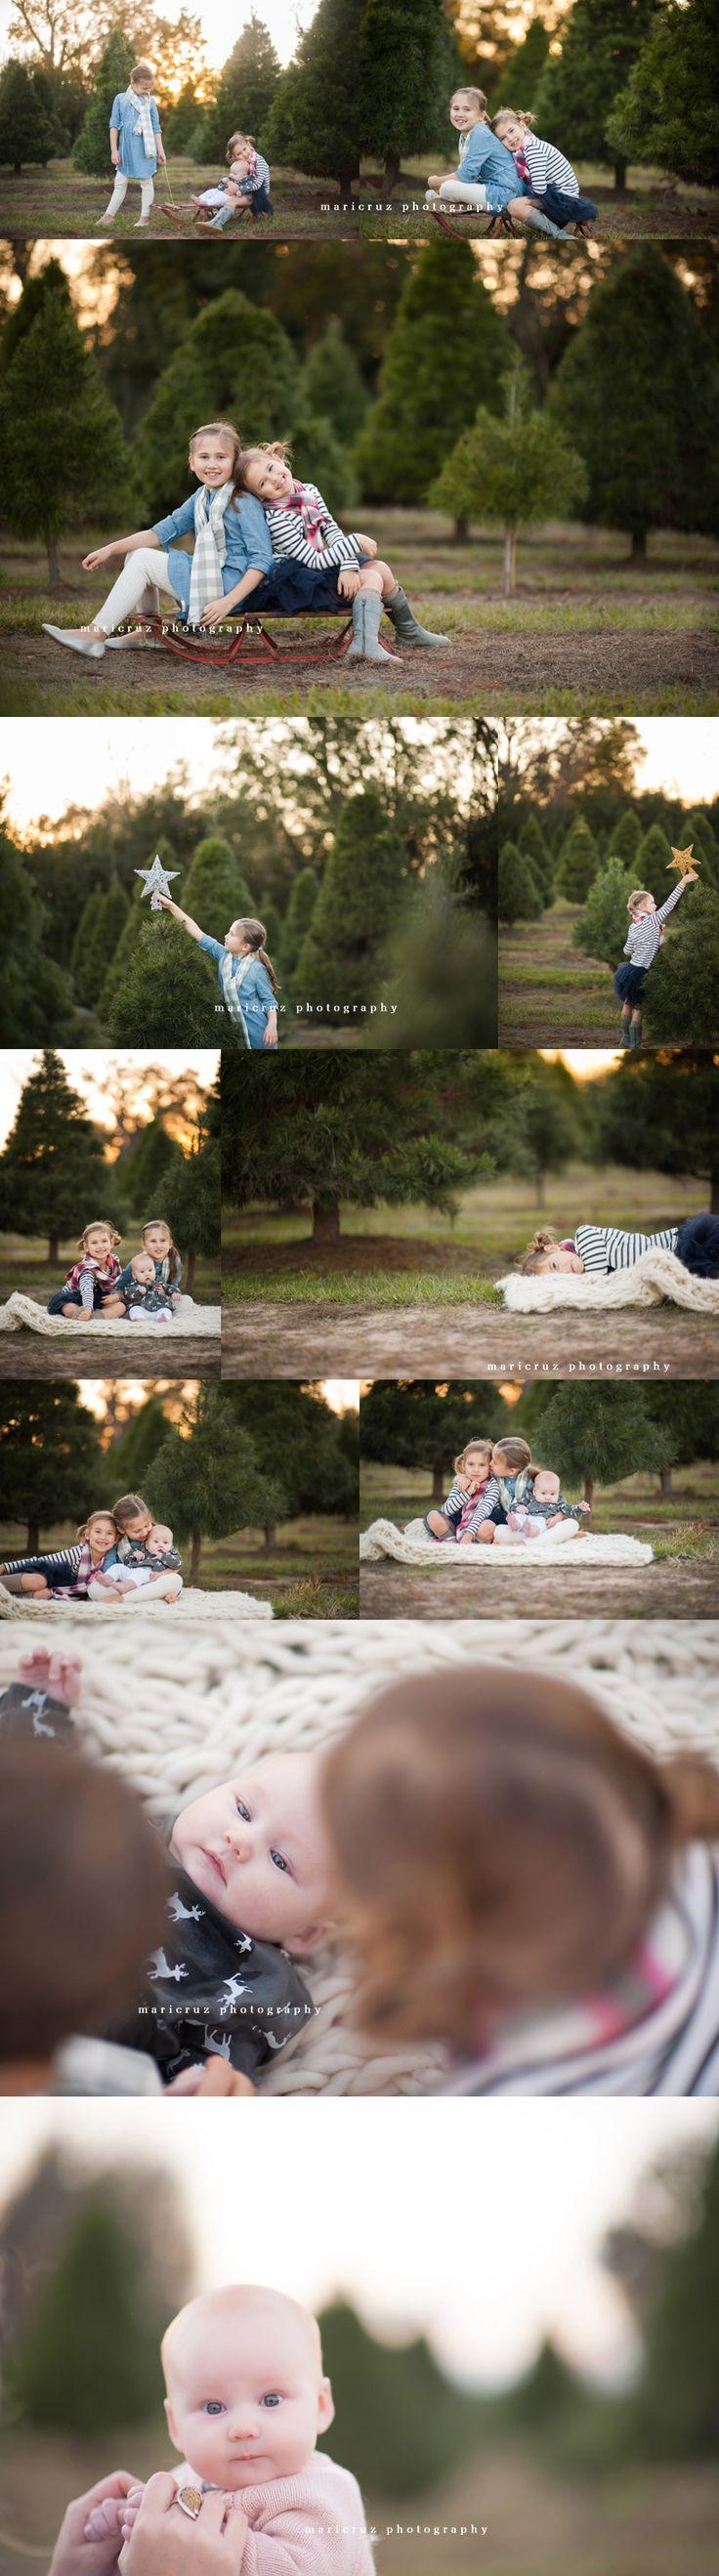 Tree Farm Sessions The Woodlands TX Family Photographer Christmas, tree farm minis, tree farm, child photography, fall minis